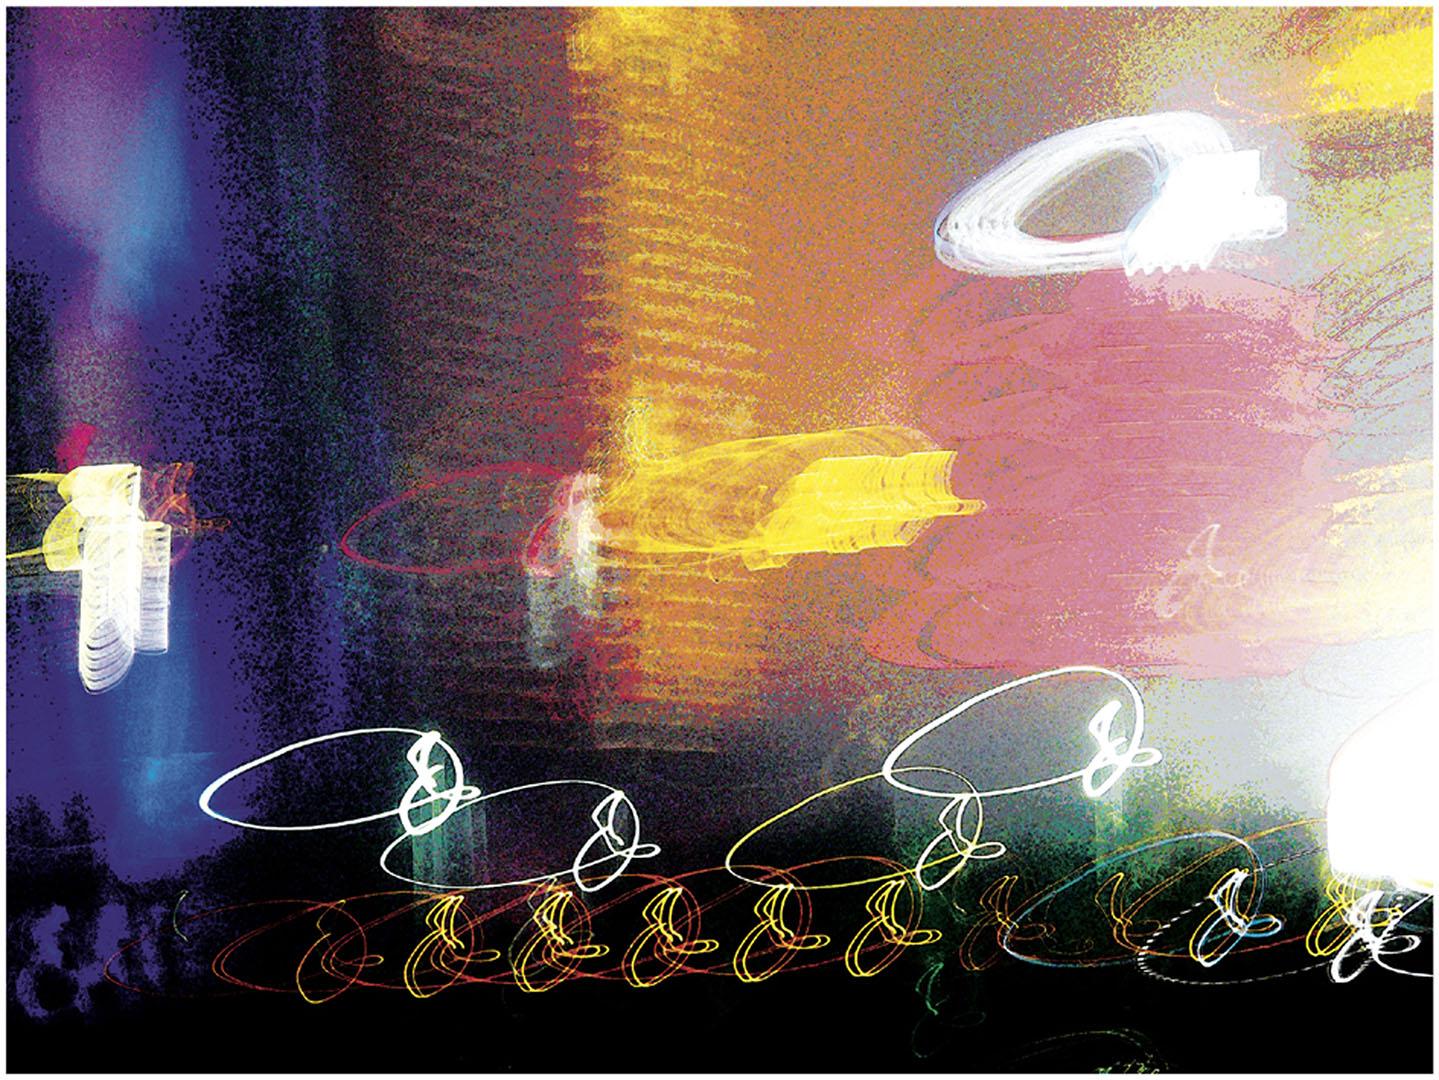 Light_Paintings_038_AXYA83